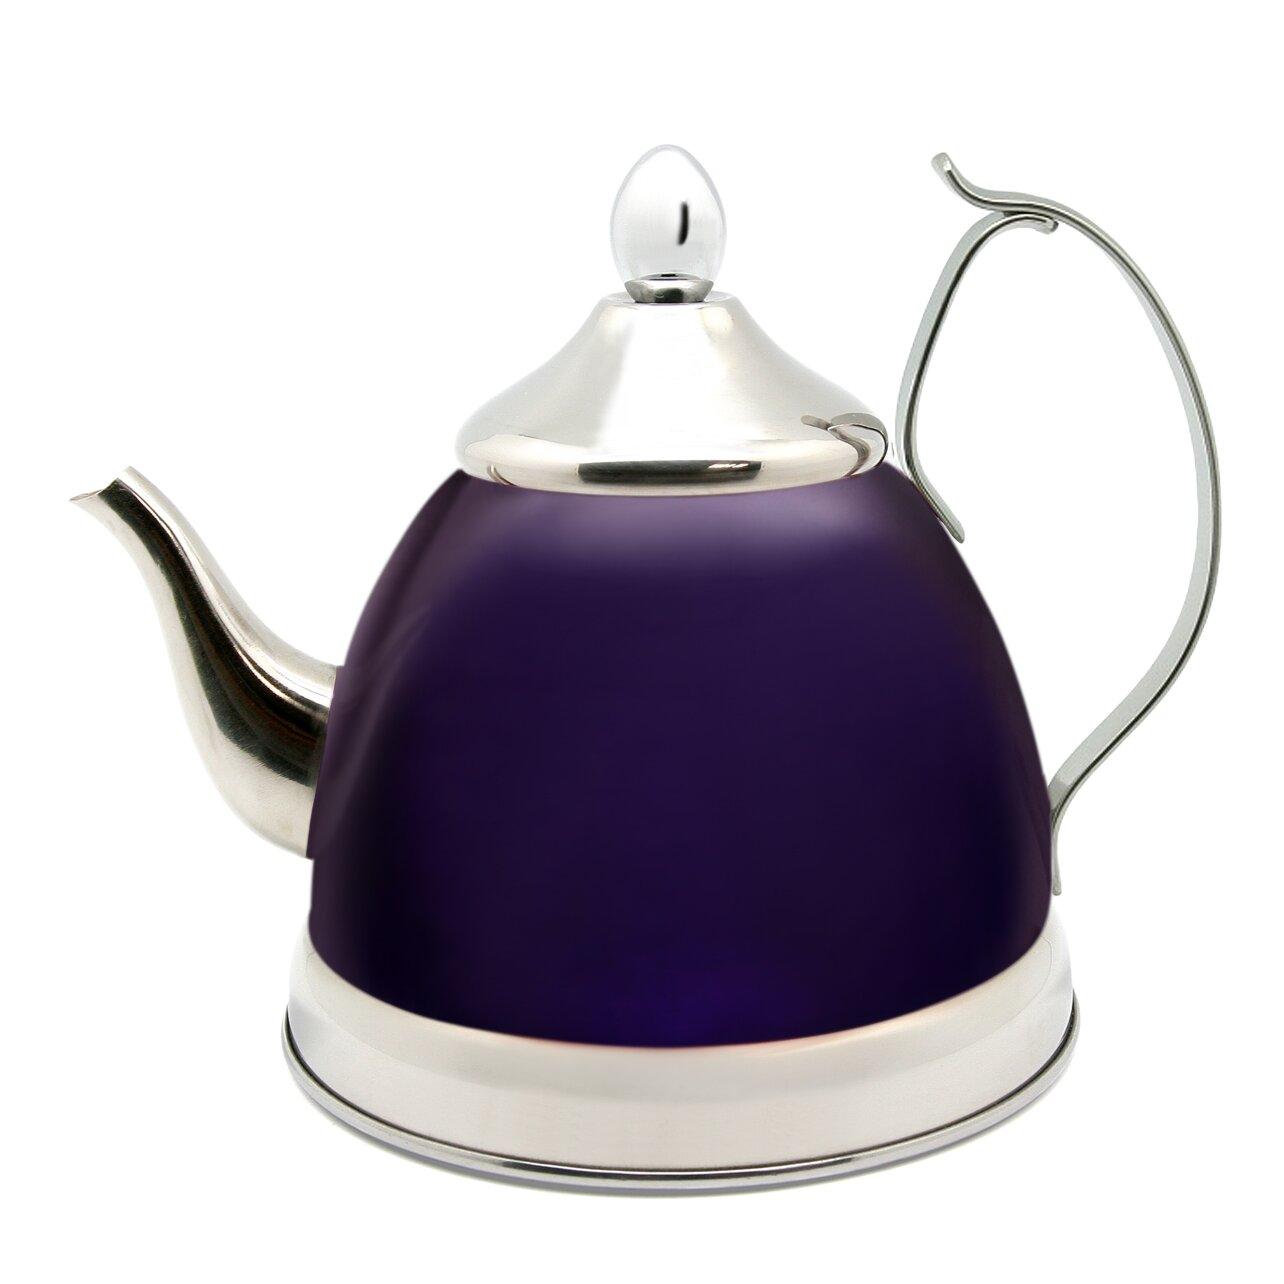 creative home nobili 1 qt infuser and tea kettle reviews wayfair. Black Bedroom Furniture Sets. Home Design Ideas